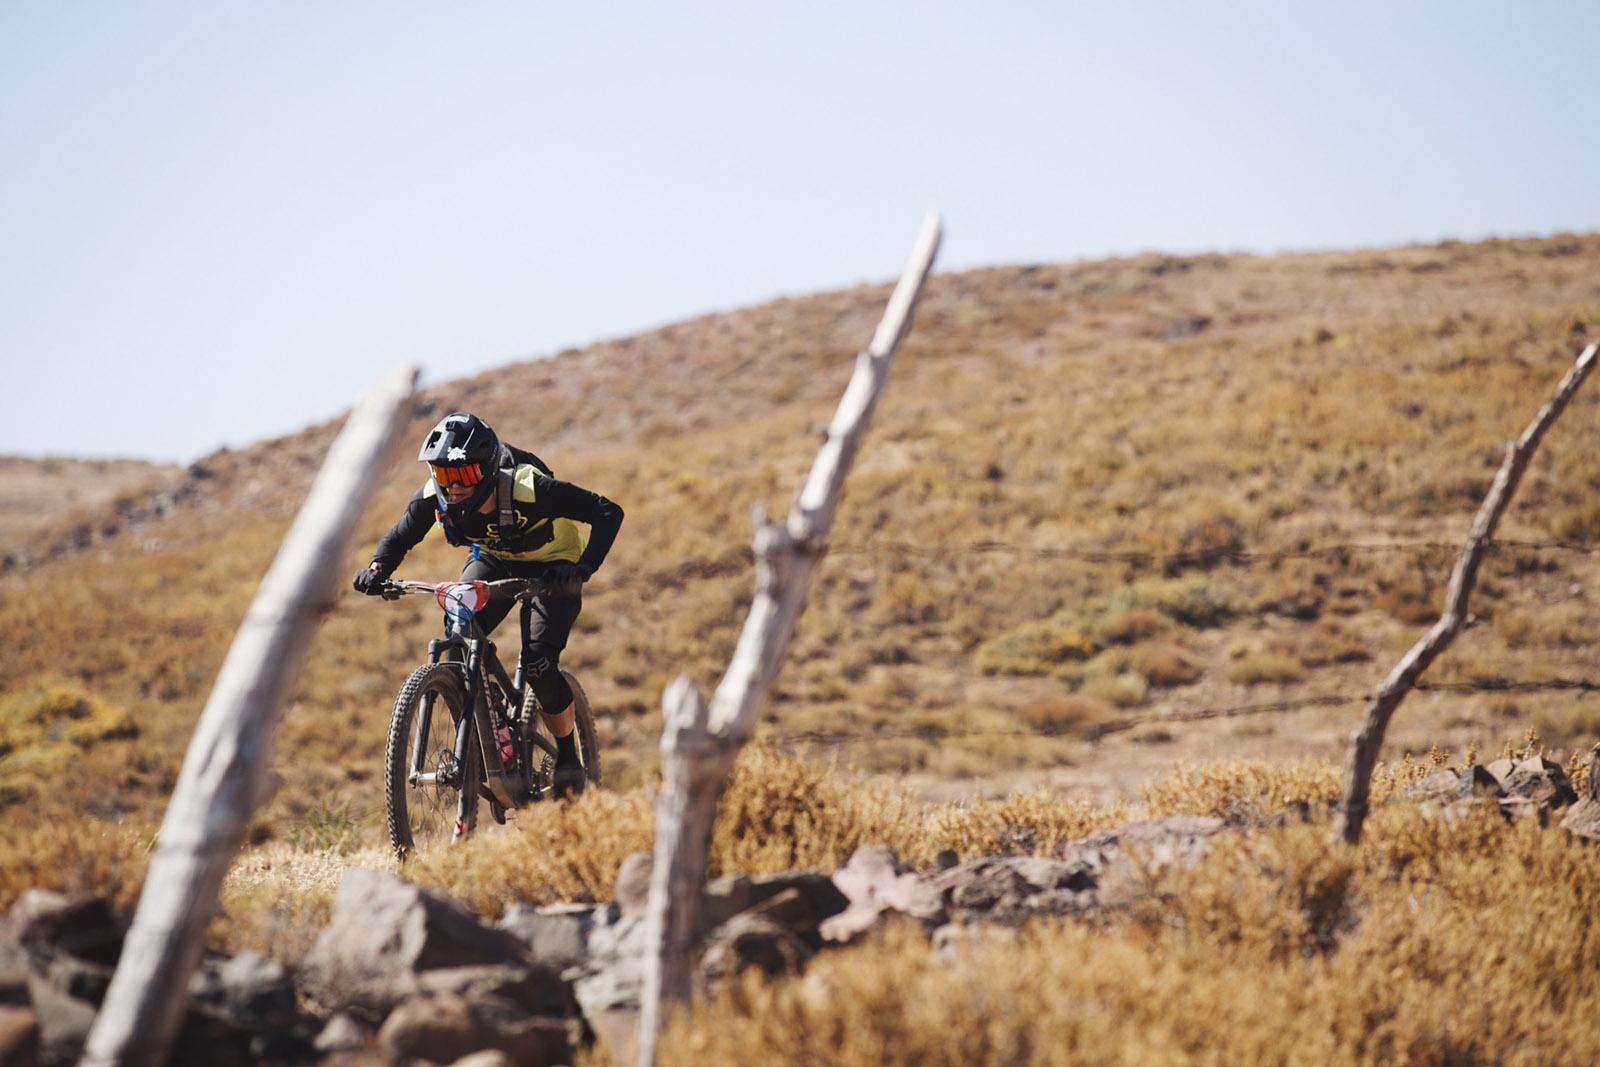 Santa Cruz Bicycles - Santa Cruz X Sram Enduro Team Mark Scott on Course at Andes Pacifico